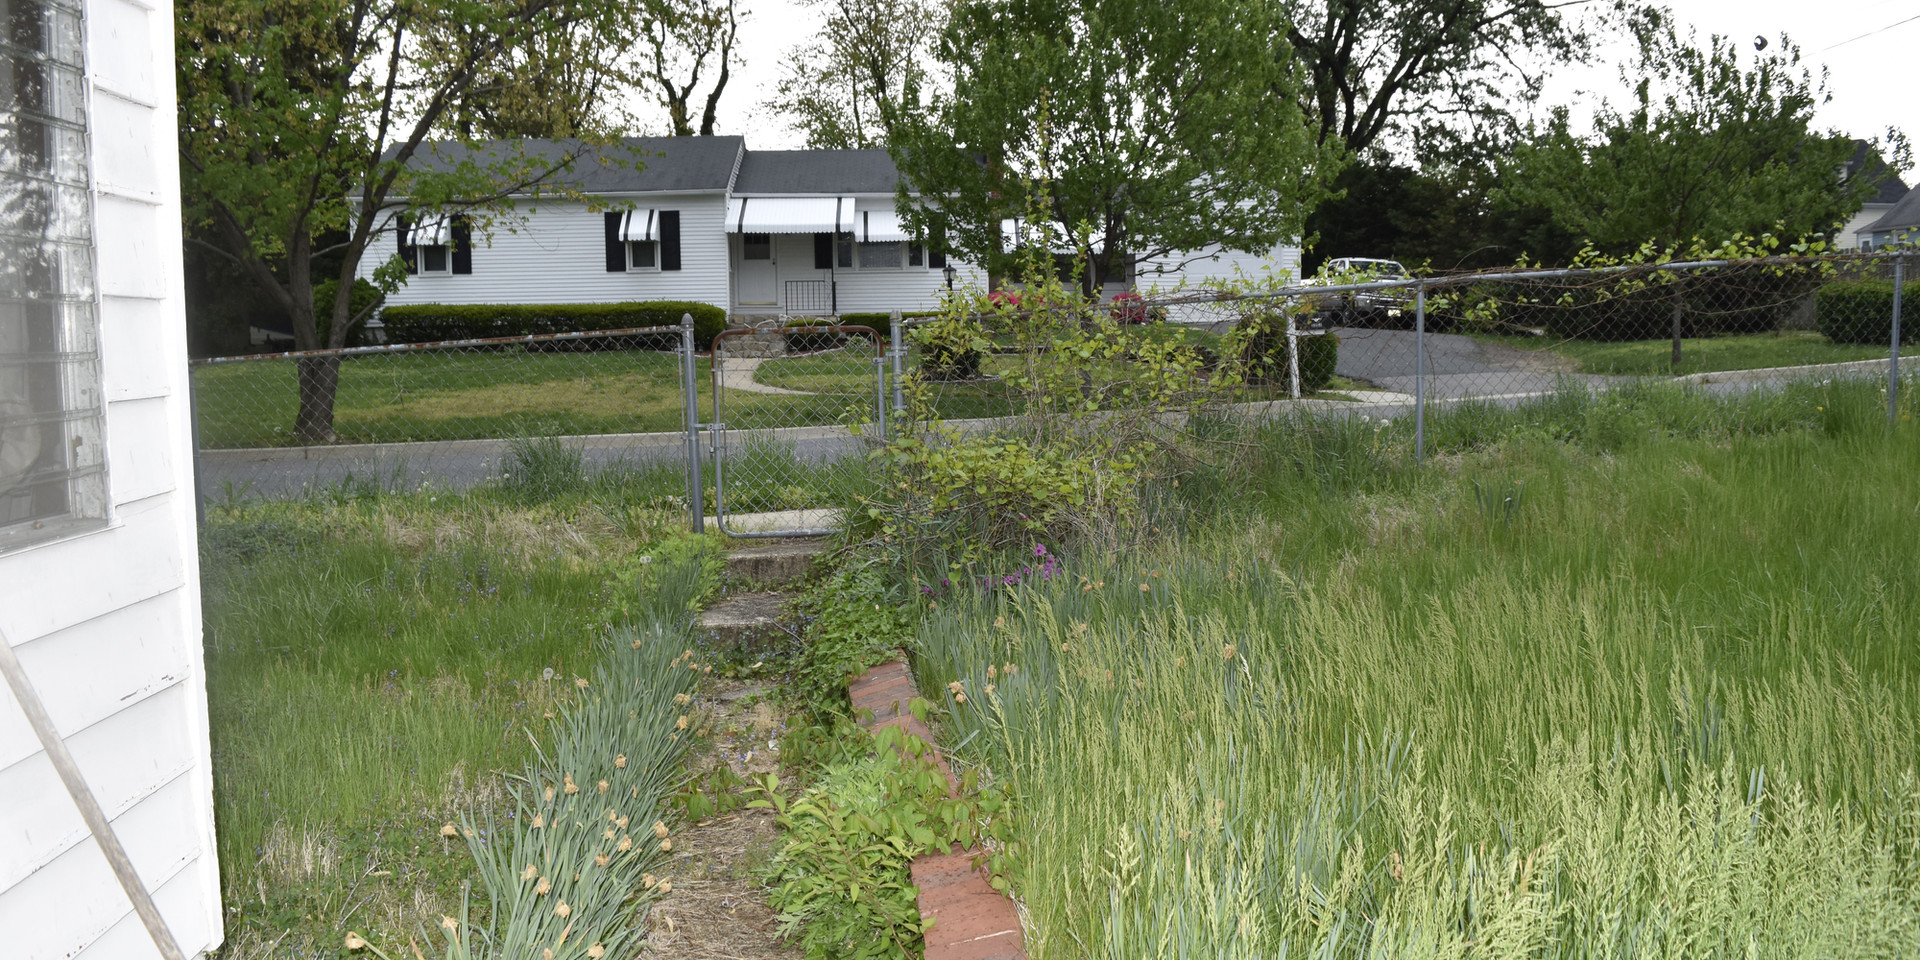 032 Exterior Rear Yard 8.JPG